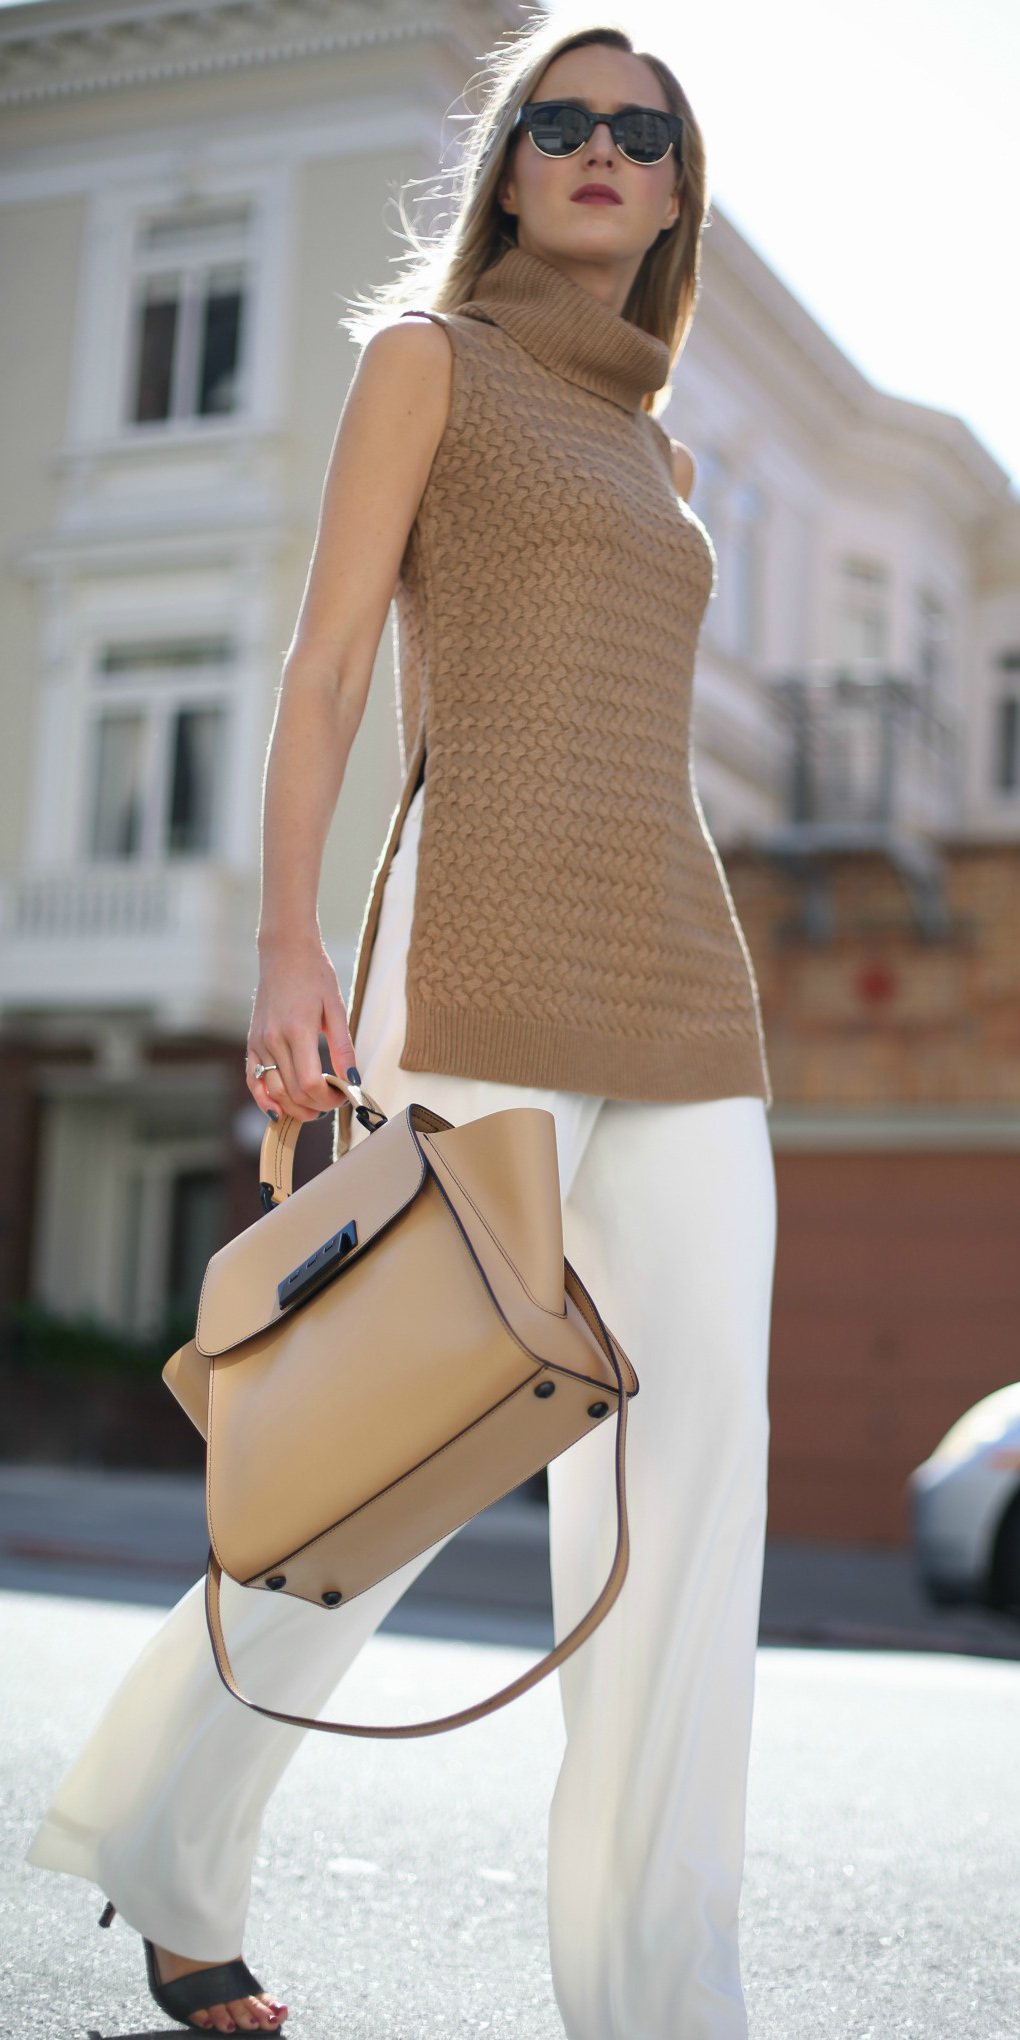 how-to-style-white-wideleg-pants-tan-bag-blonde-tan-sweater-sleeveless-black-shoe-sandalh-sun-fall-winter-fashion-work.jpg